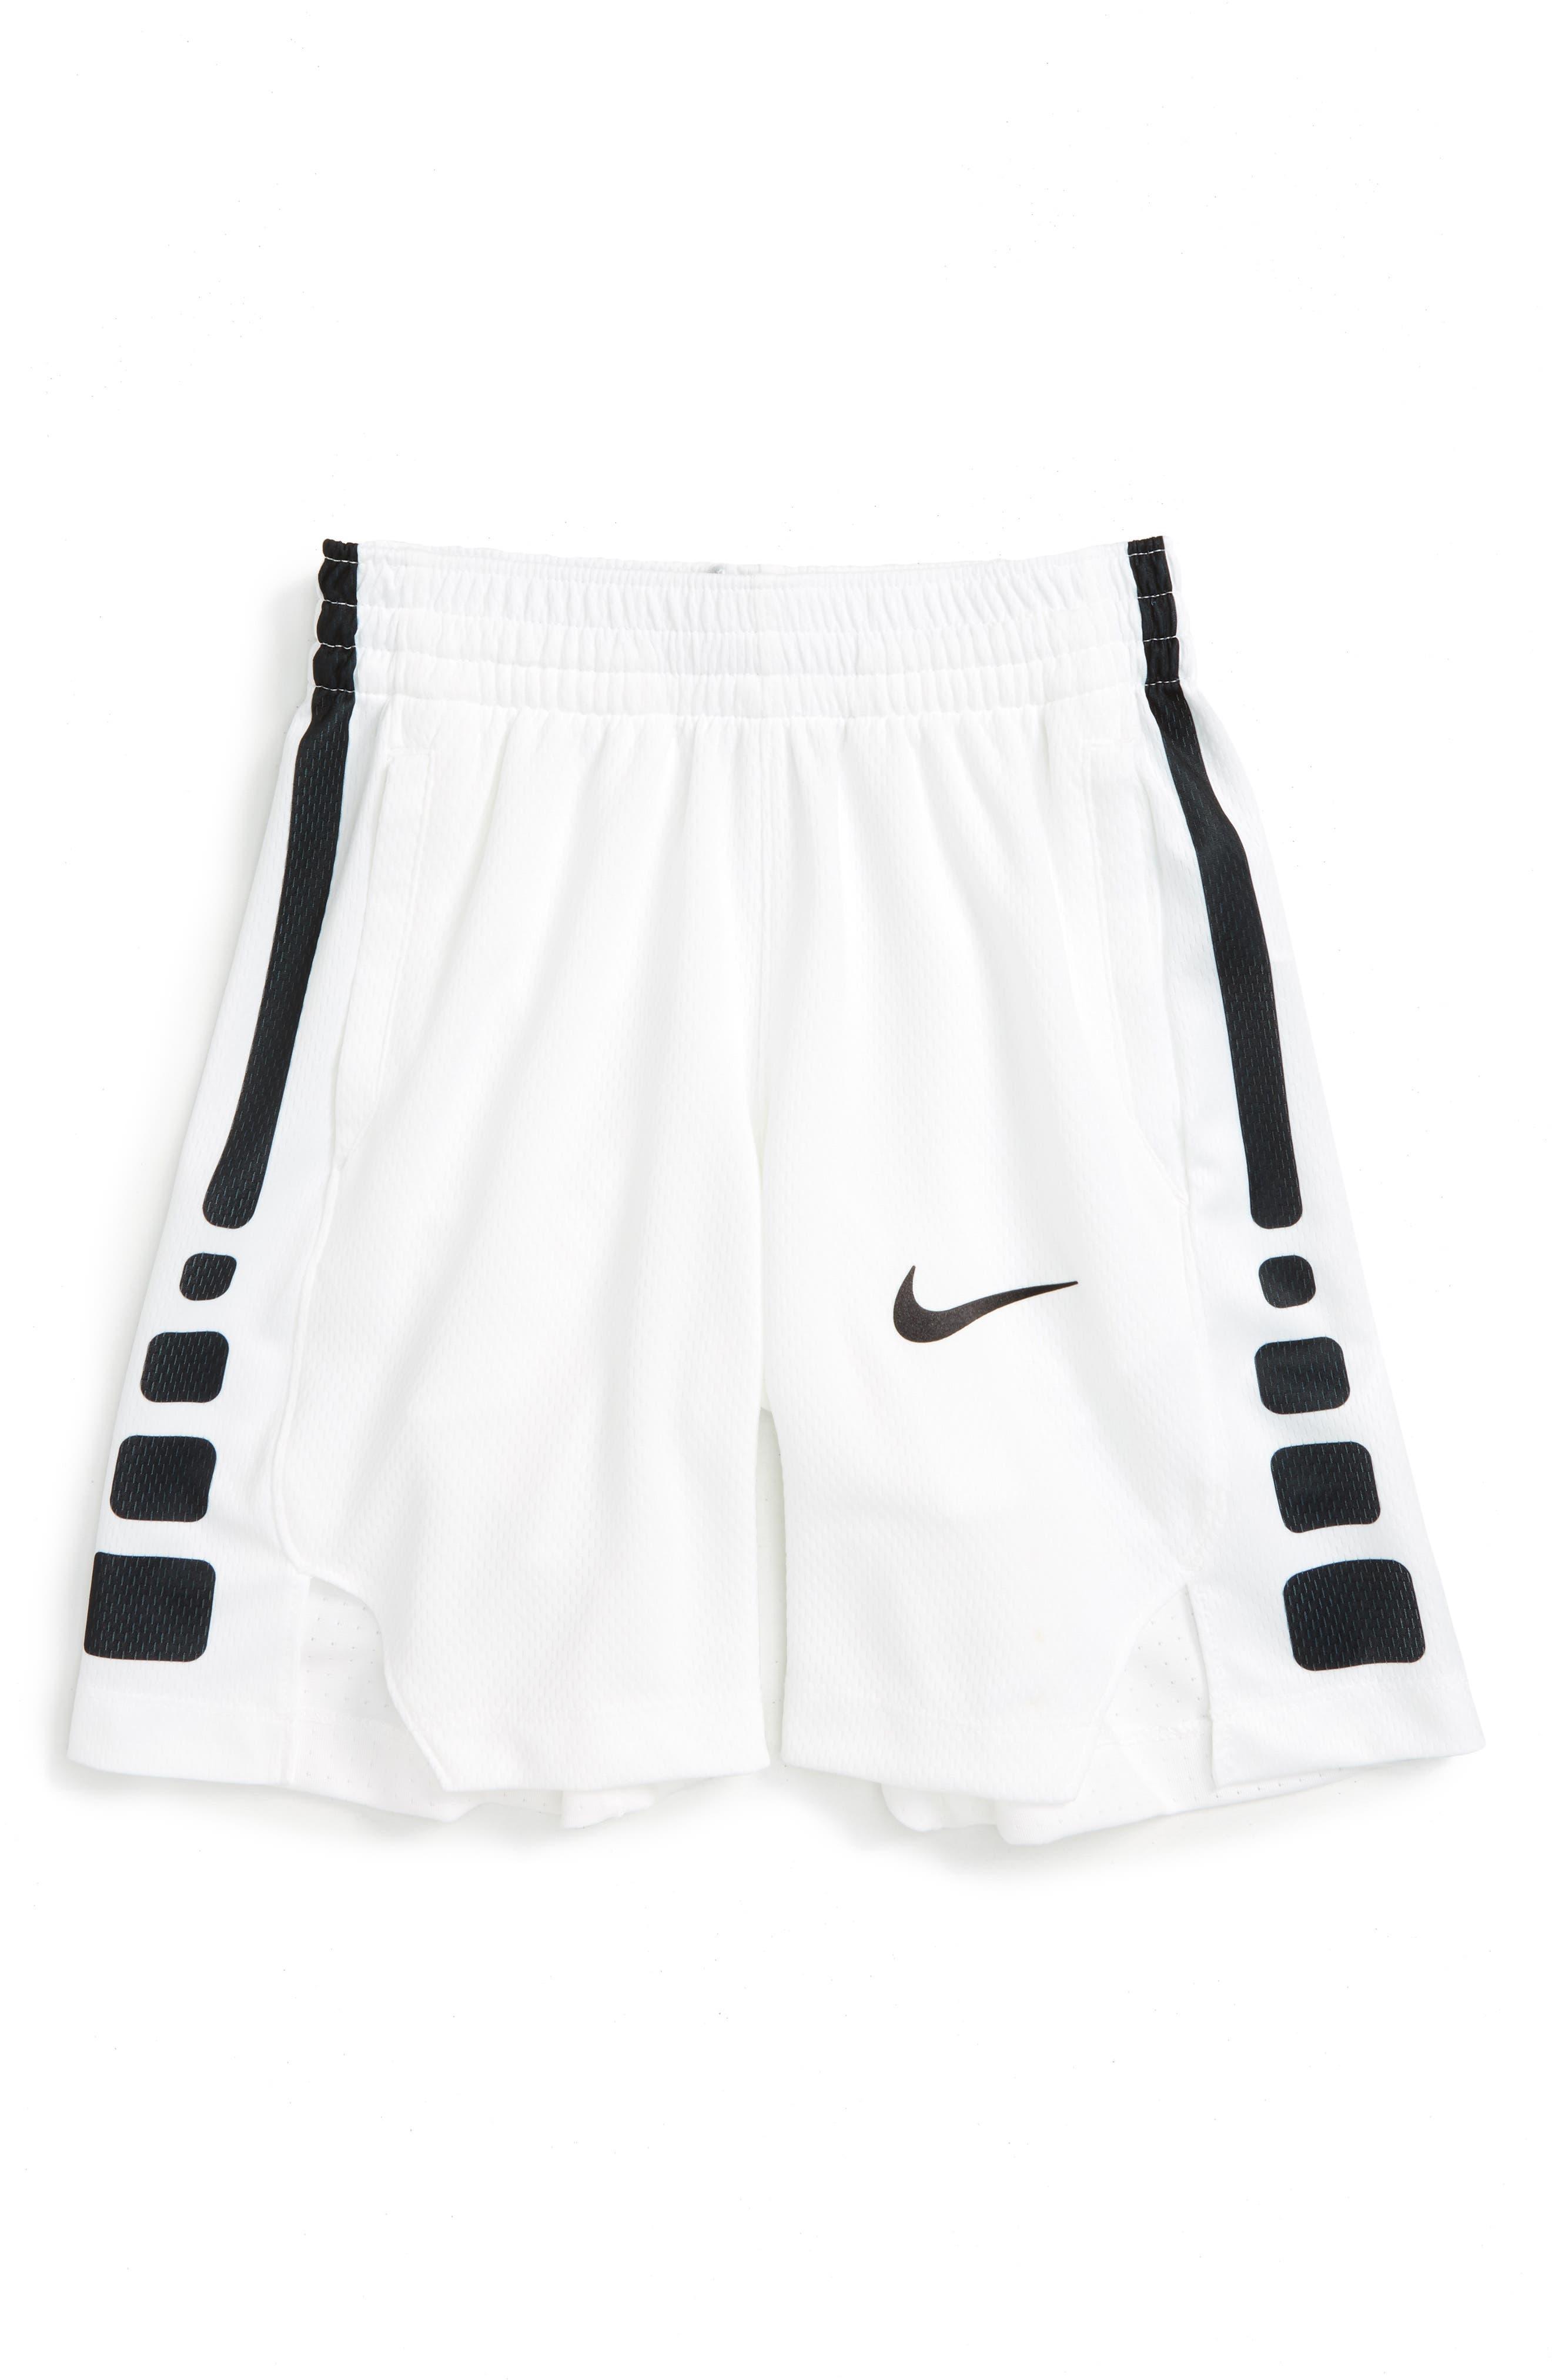 Nike Dry Elite Basketball Shorts (Little Boys & Big Boys) (Regular Retail Price: $32.00)